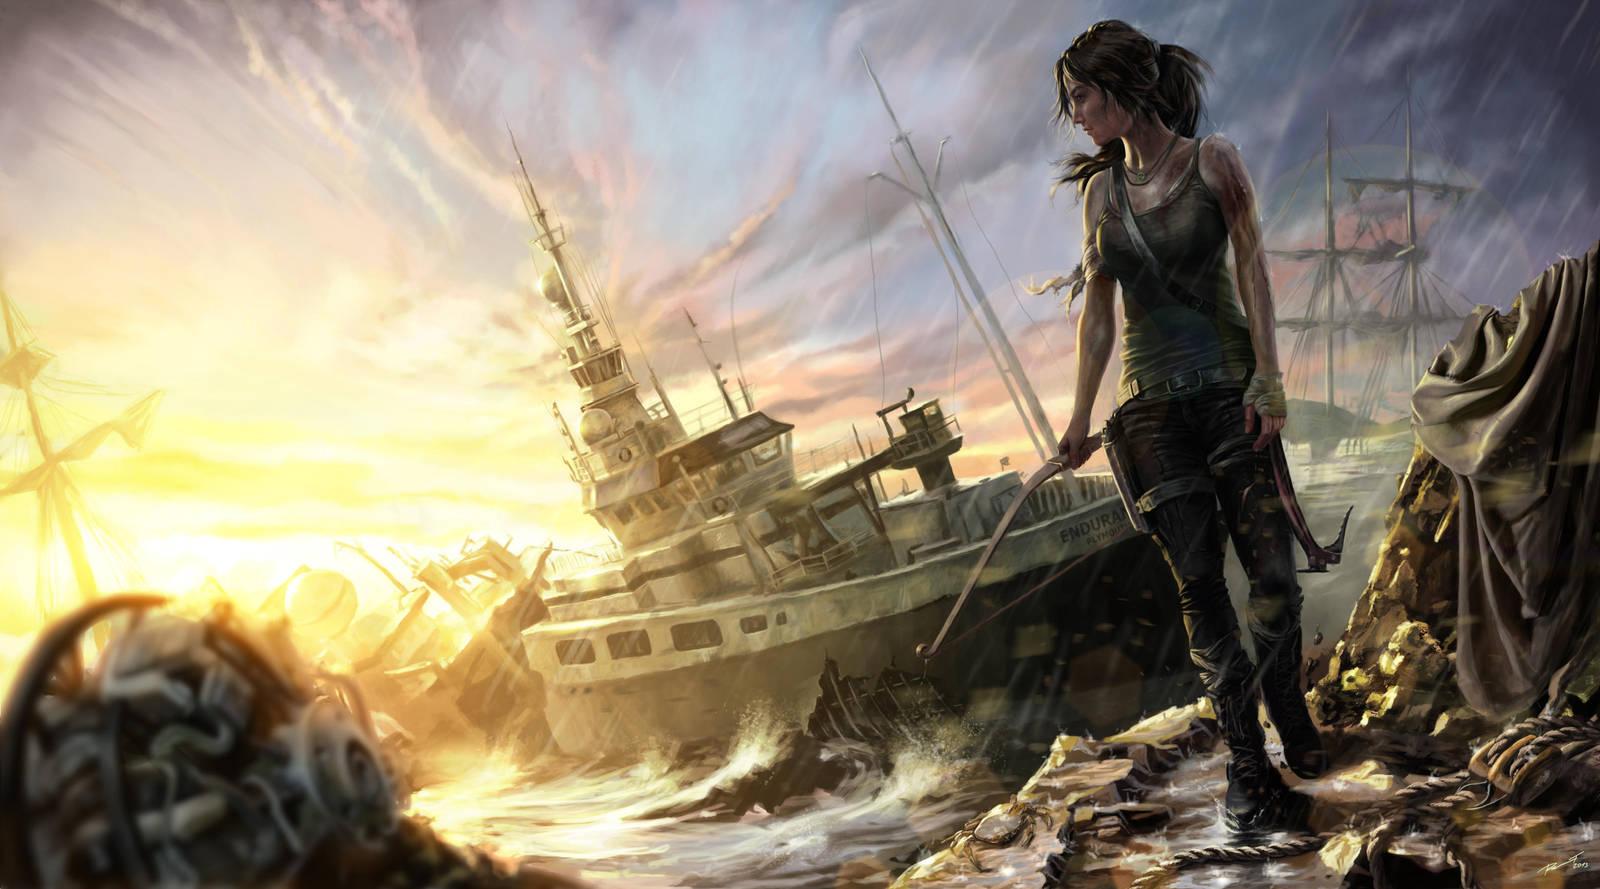 Tomb Raider Reborn contest entry by KardisArt